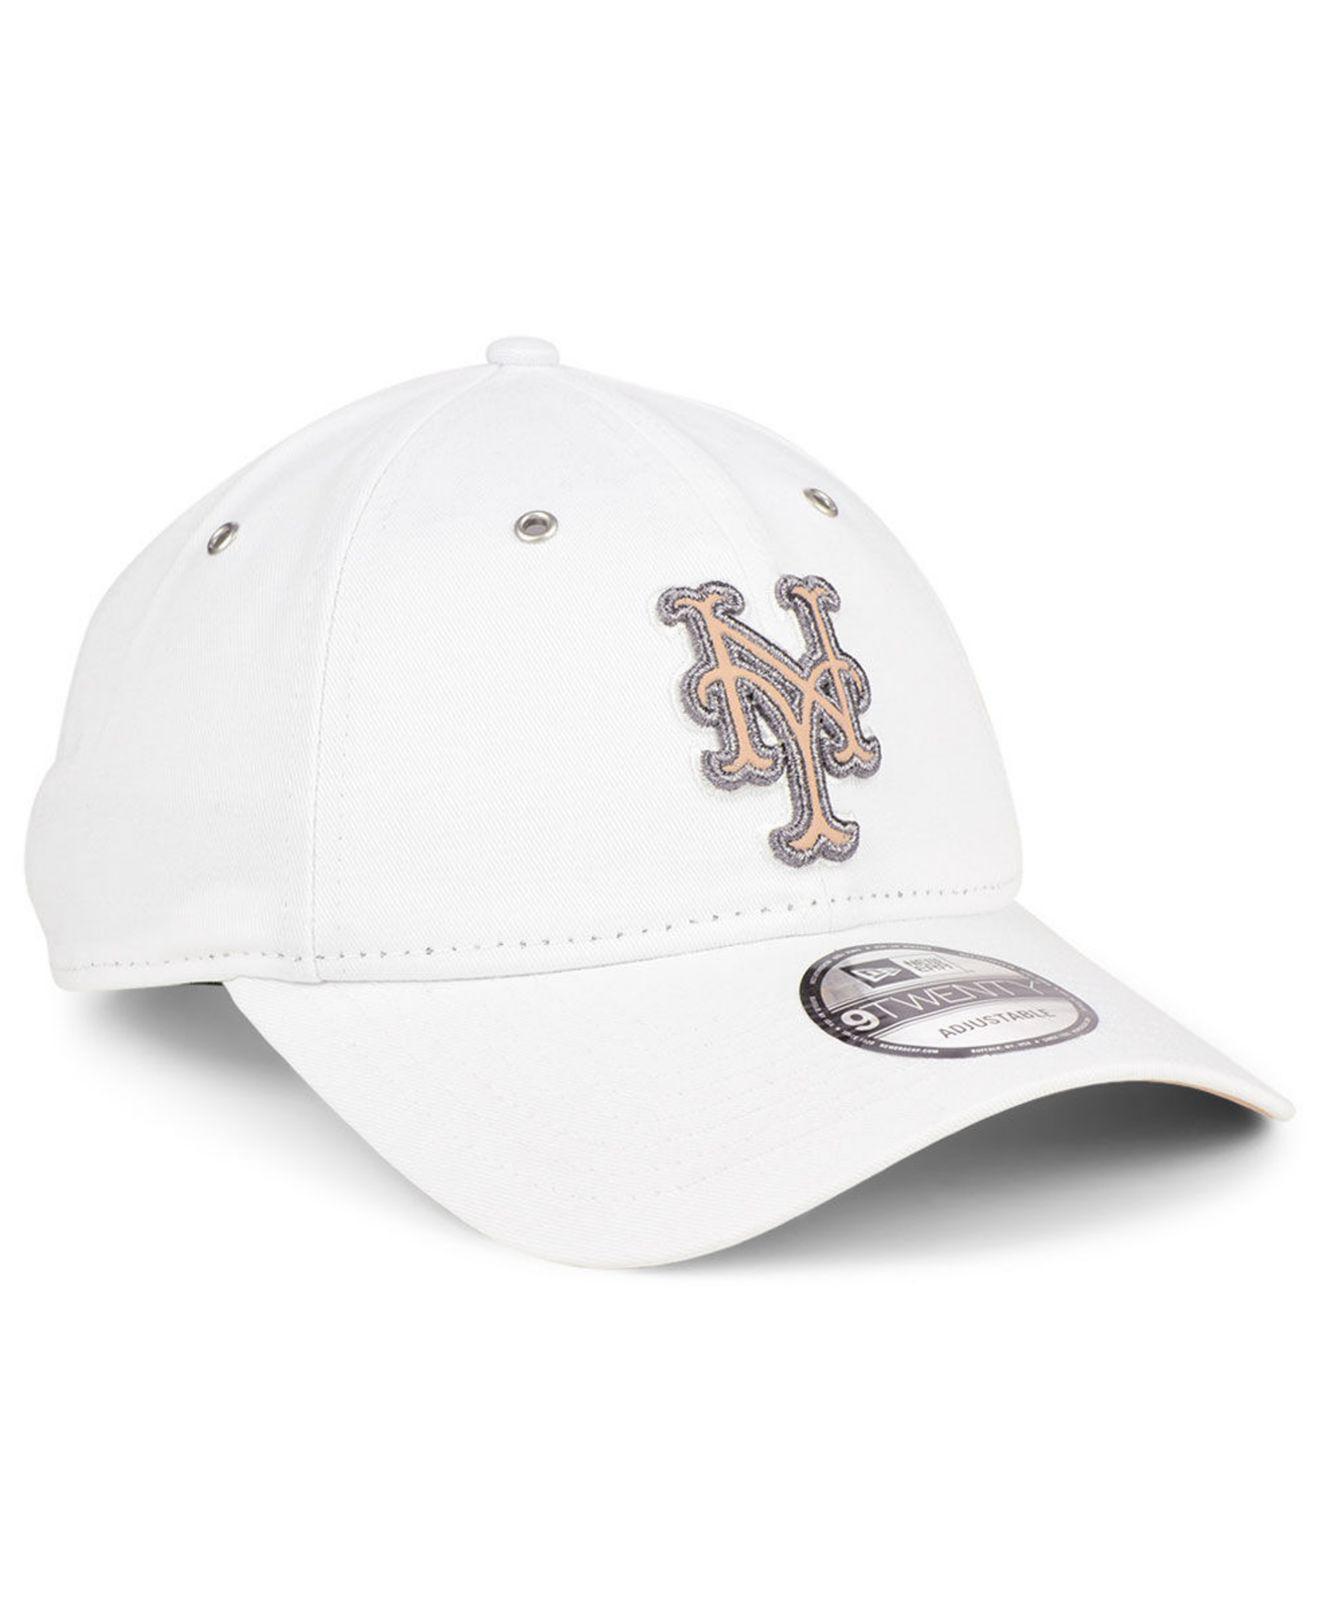 1a48f9f1549 ... get lyst ktz new york mets metallic pastel 9twenty cap in white for men  5459b 7fde9